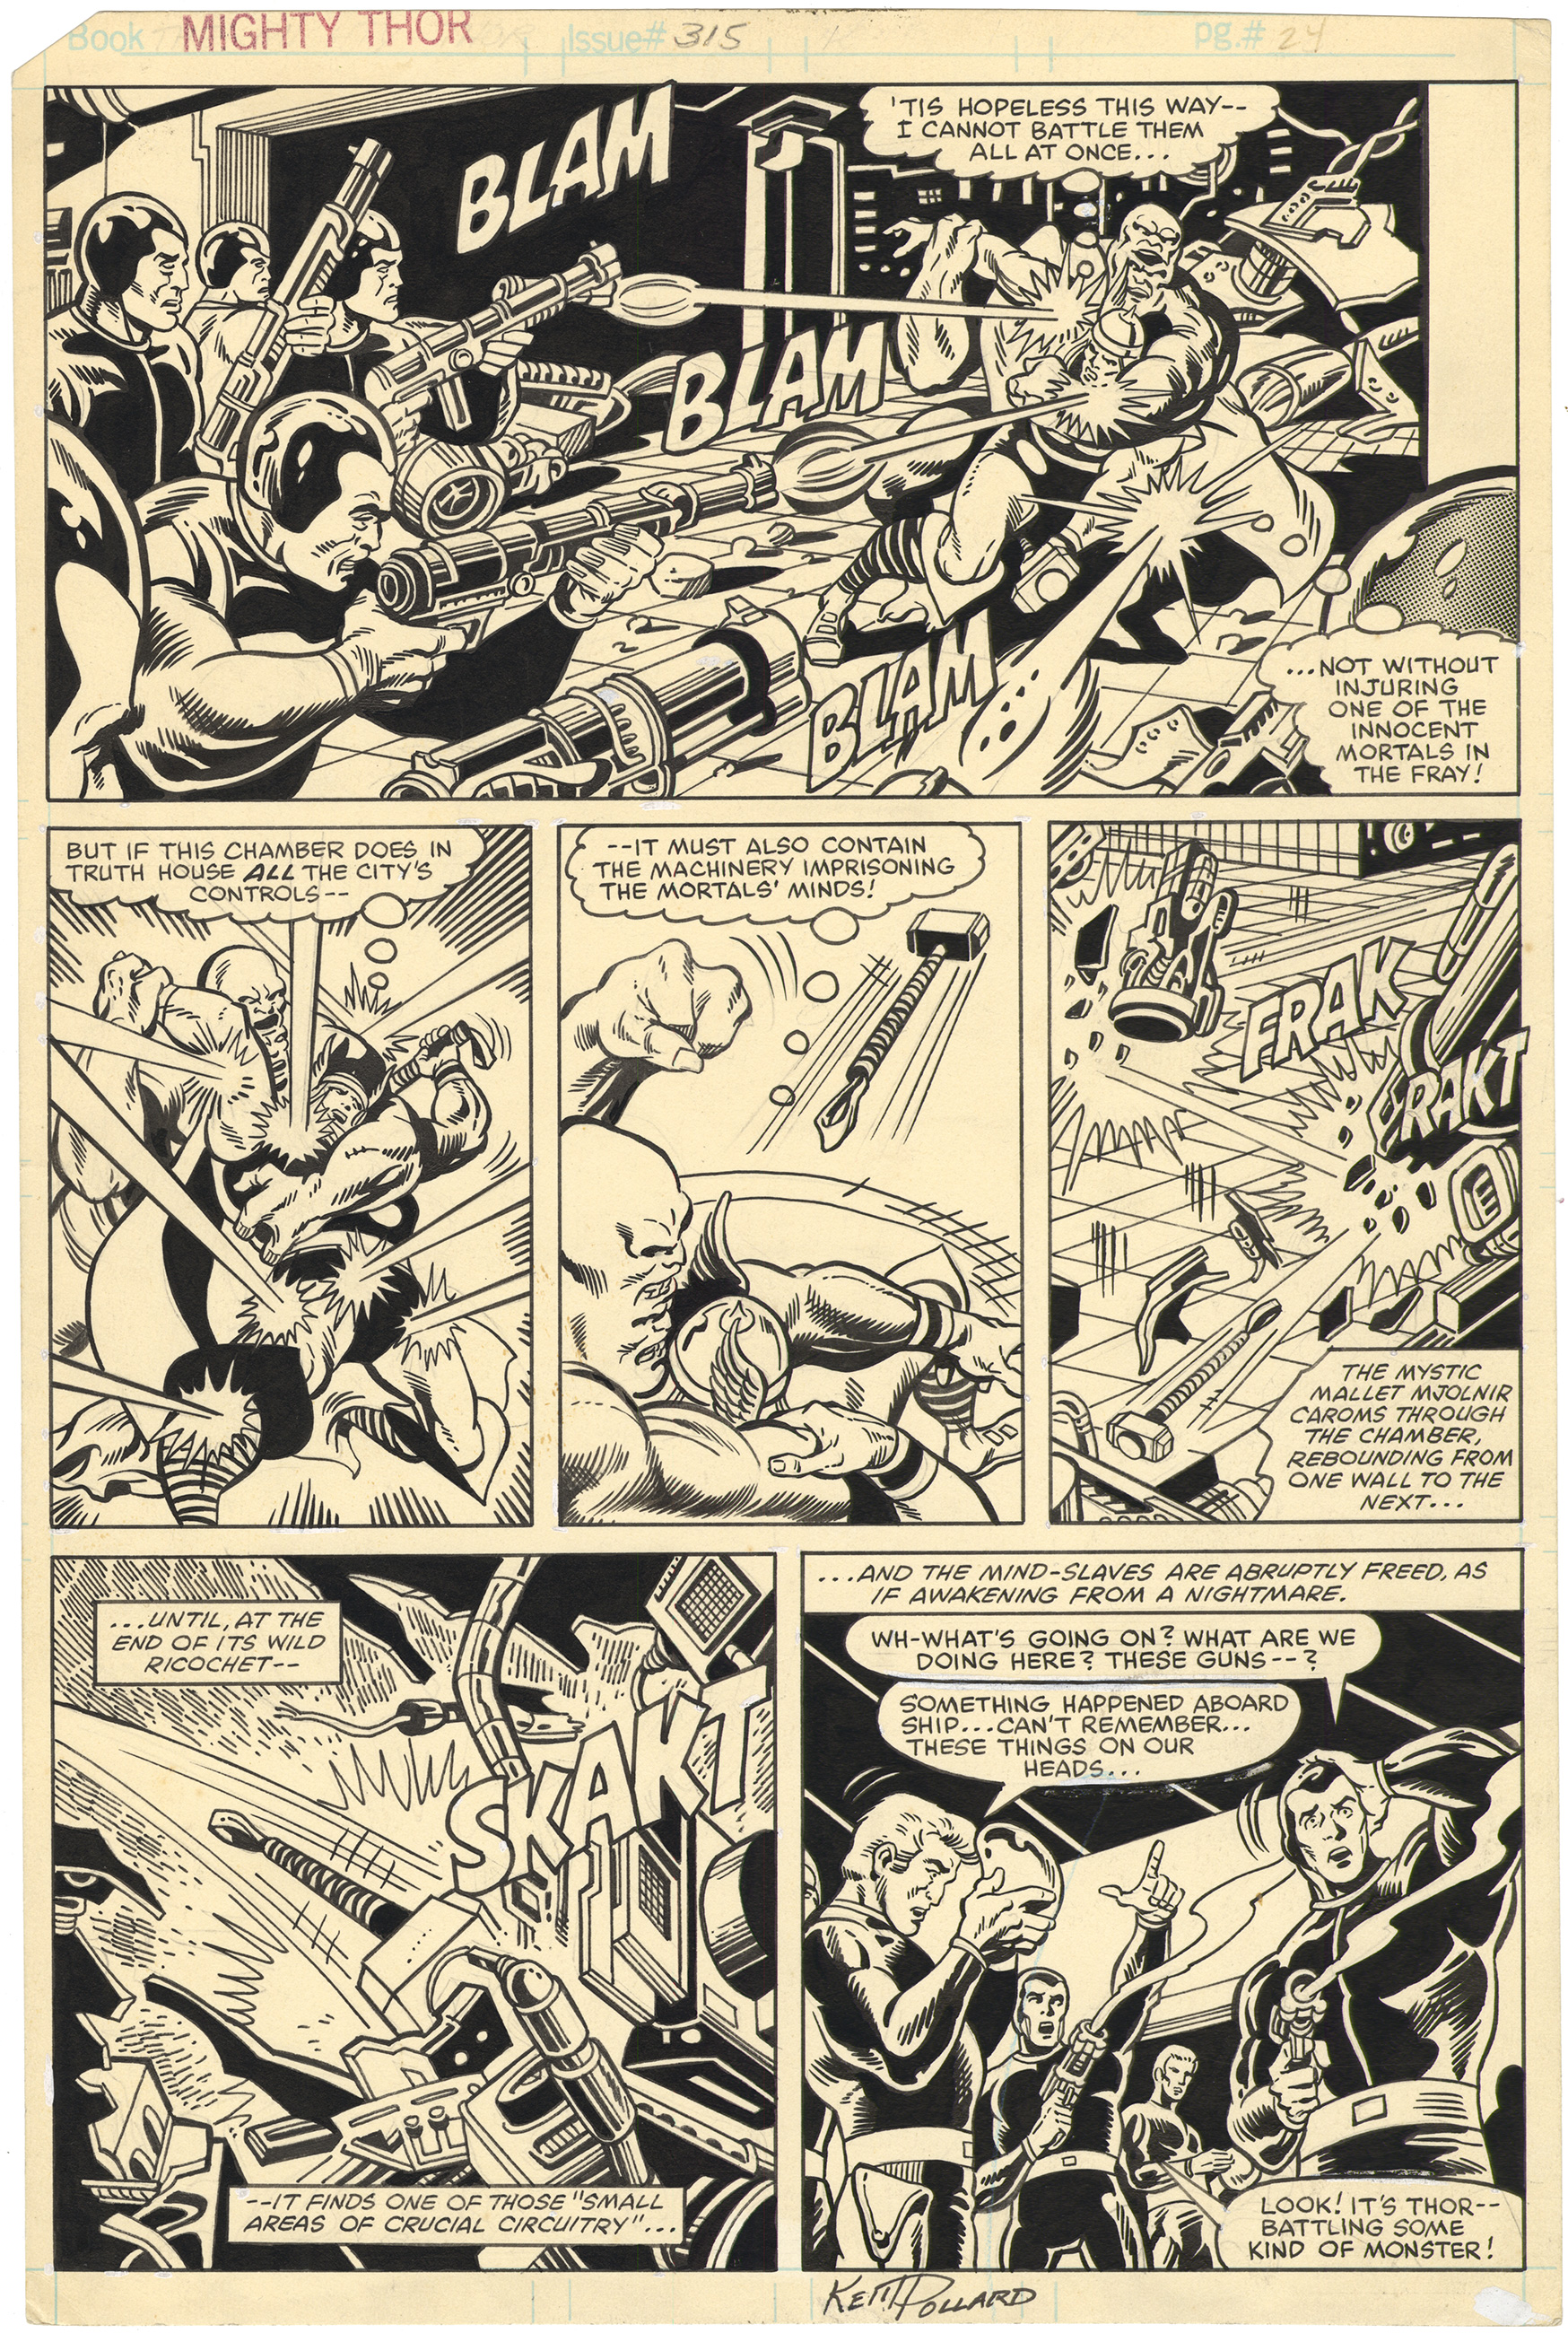 Thor #315 p24 (Signed)